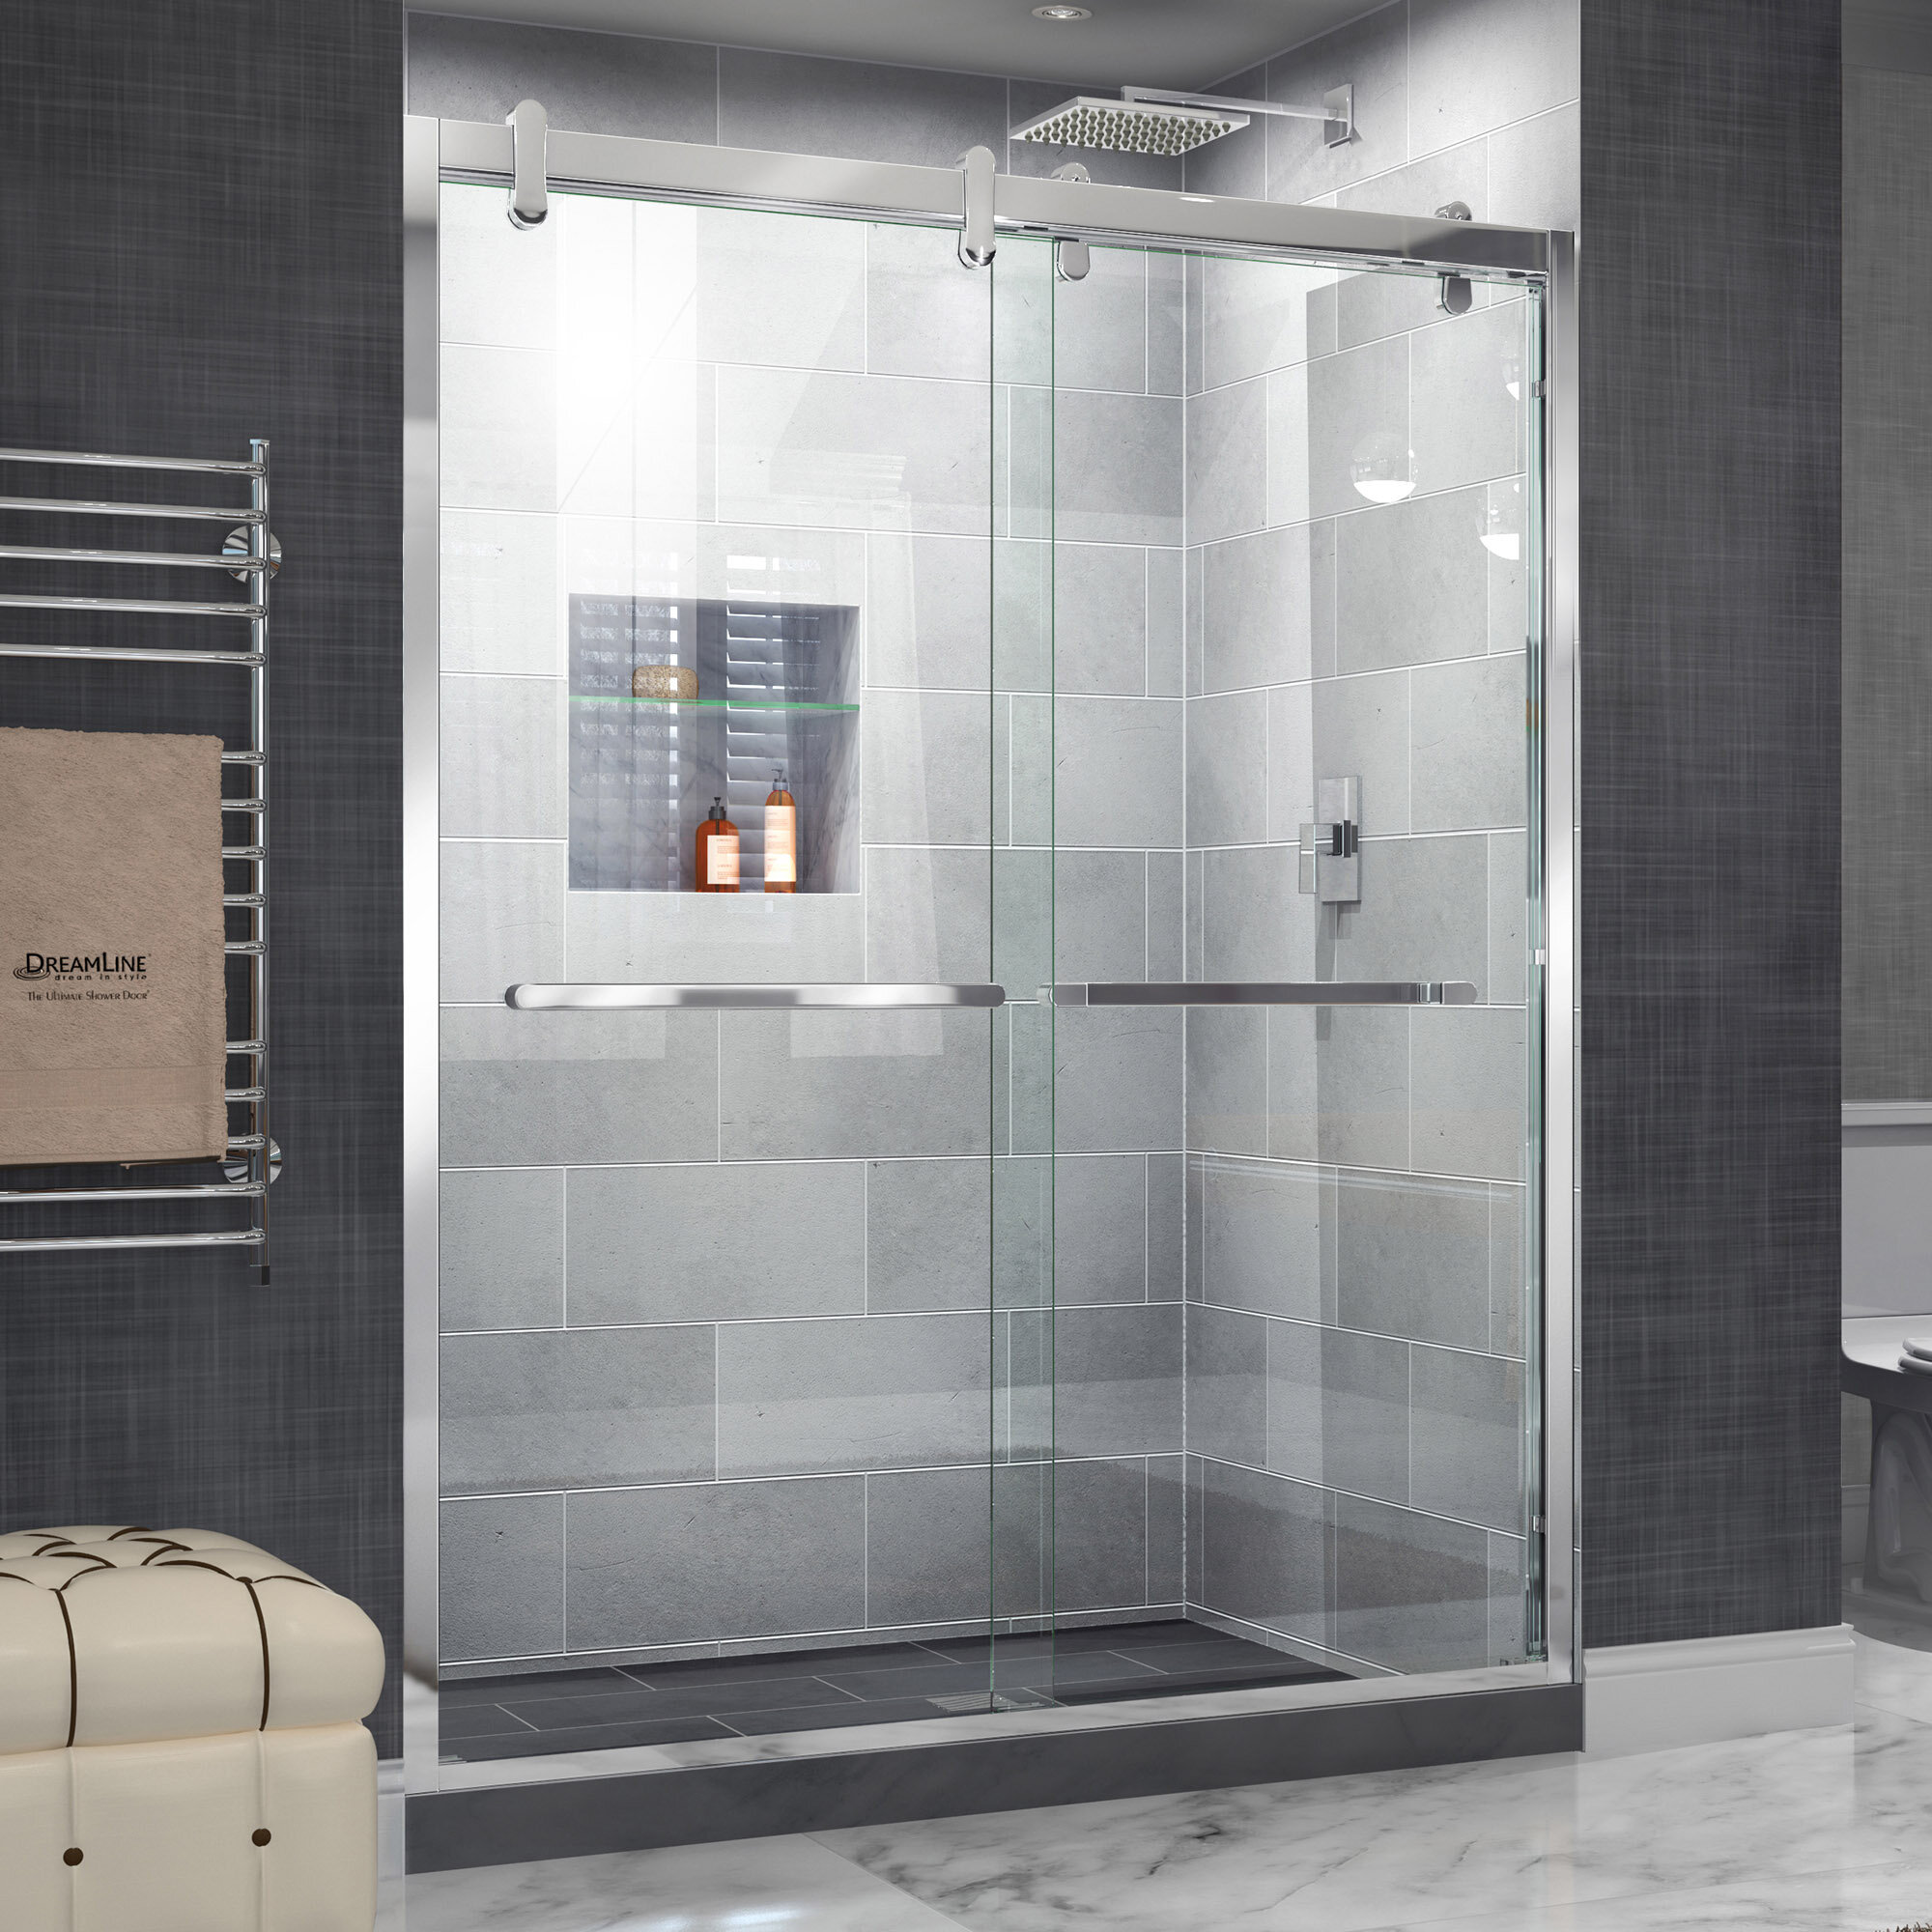 Dreamline Cavalier 60 X 77 38 Byp Semi Frameless Shower Door With Clearmax Technology Wayfair